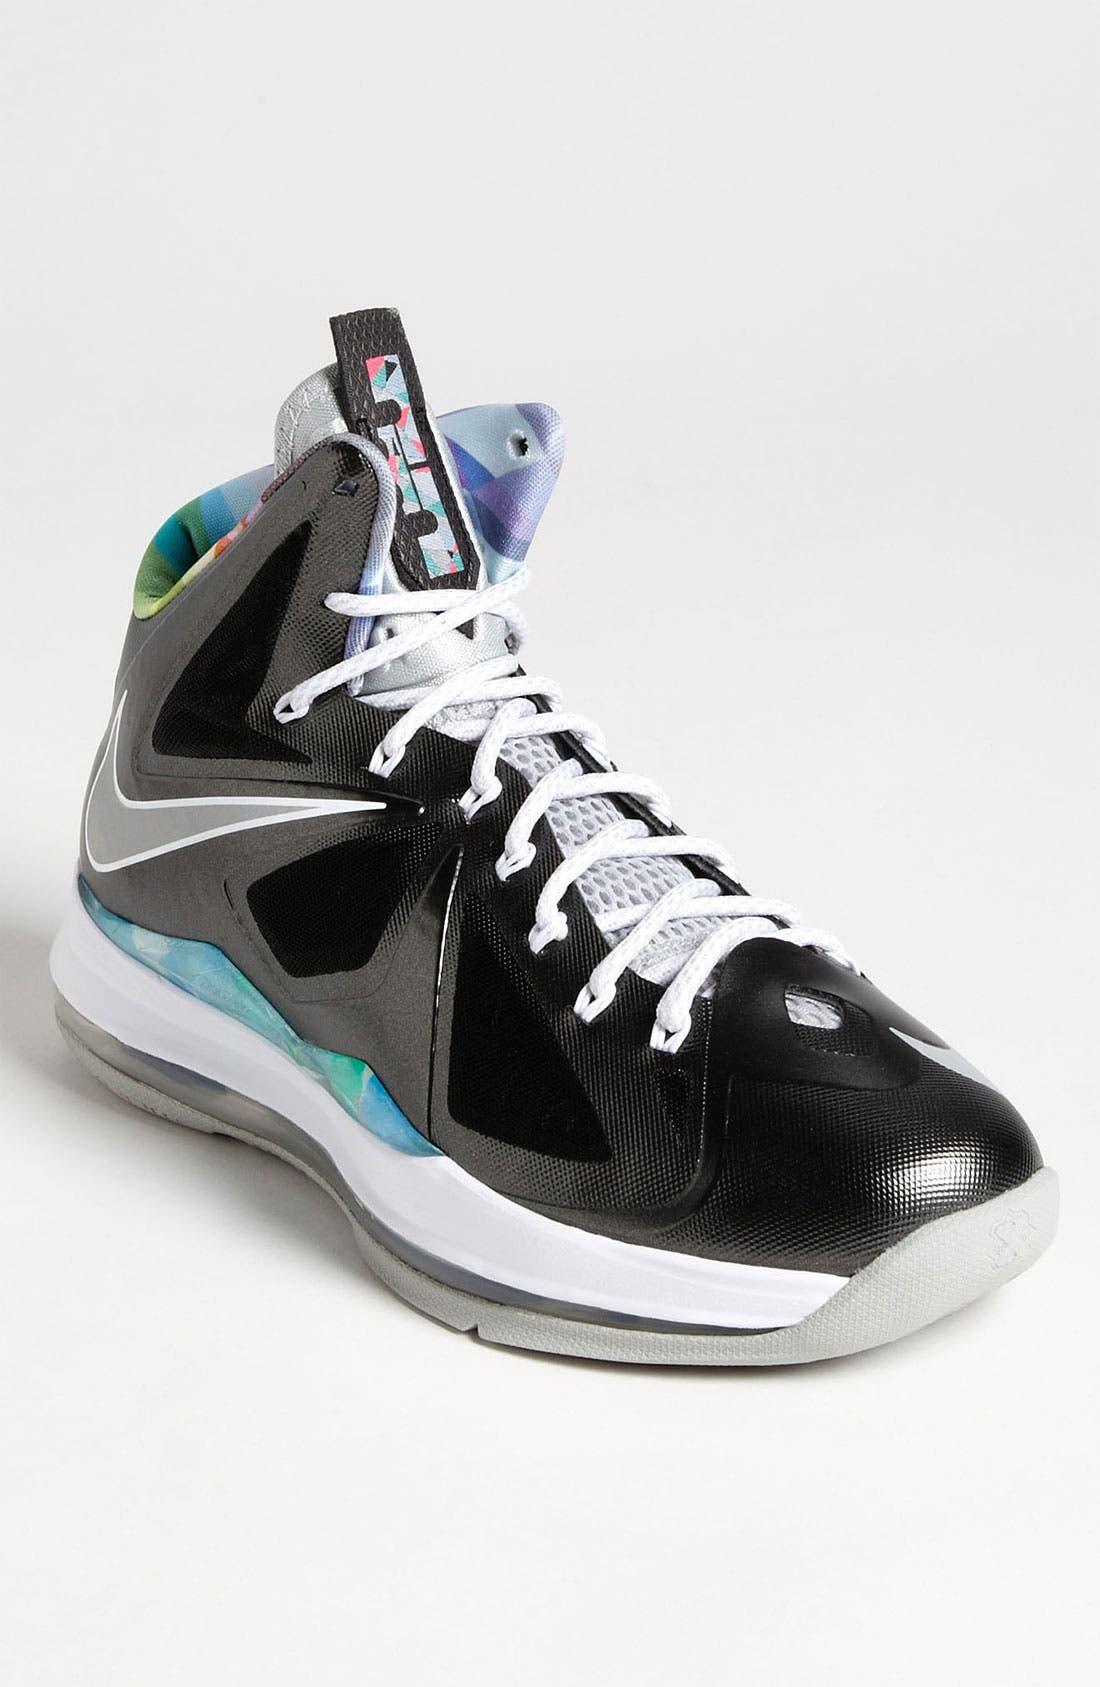 Alternate Image 1 Selected - Nike 'LeBron X' Basketball Shoe (Men)